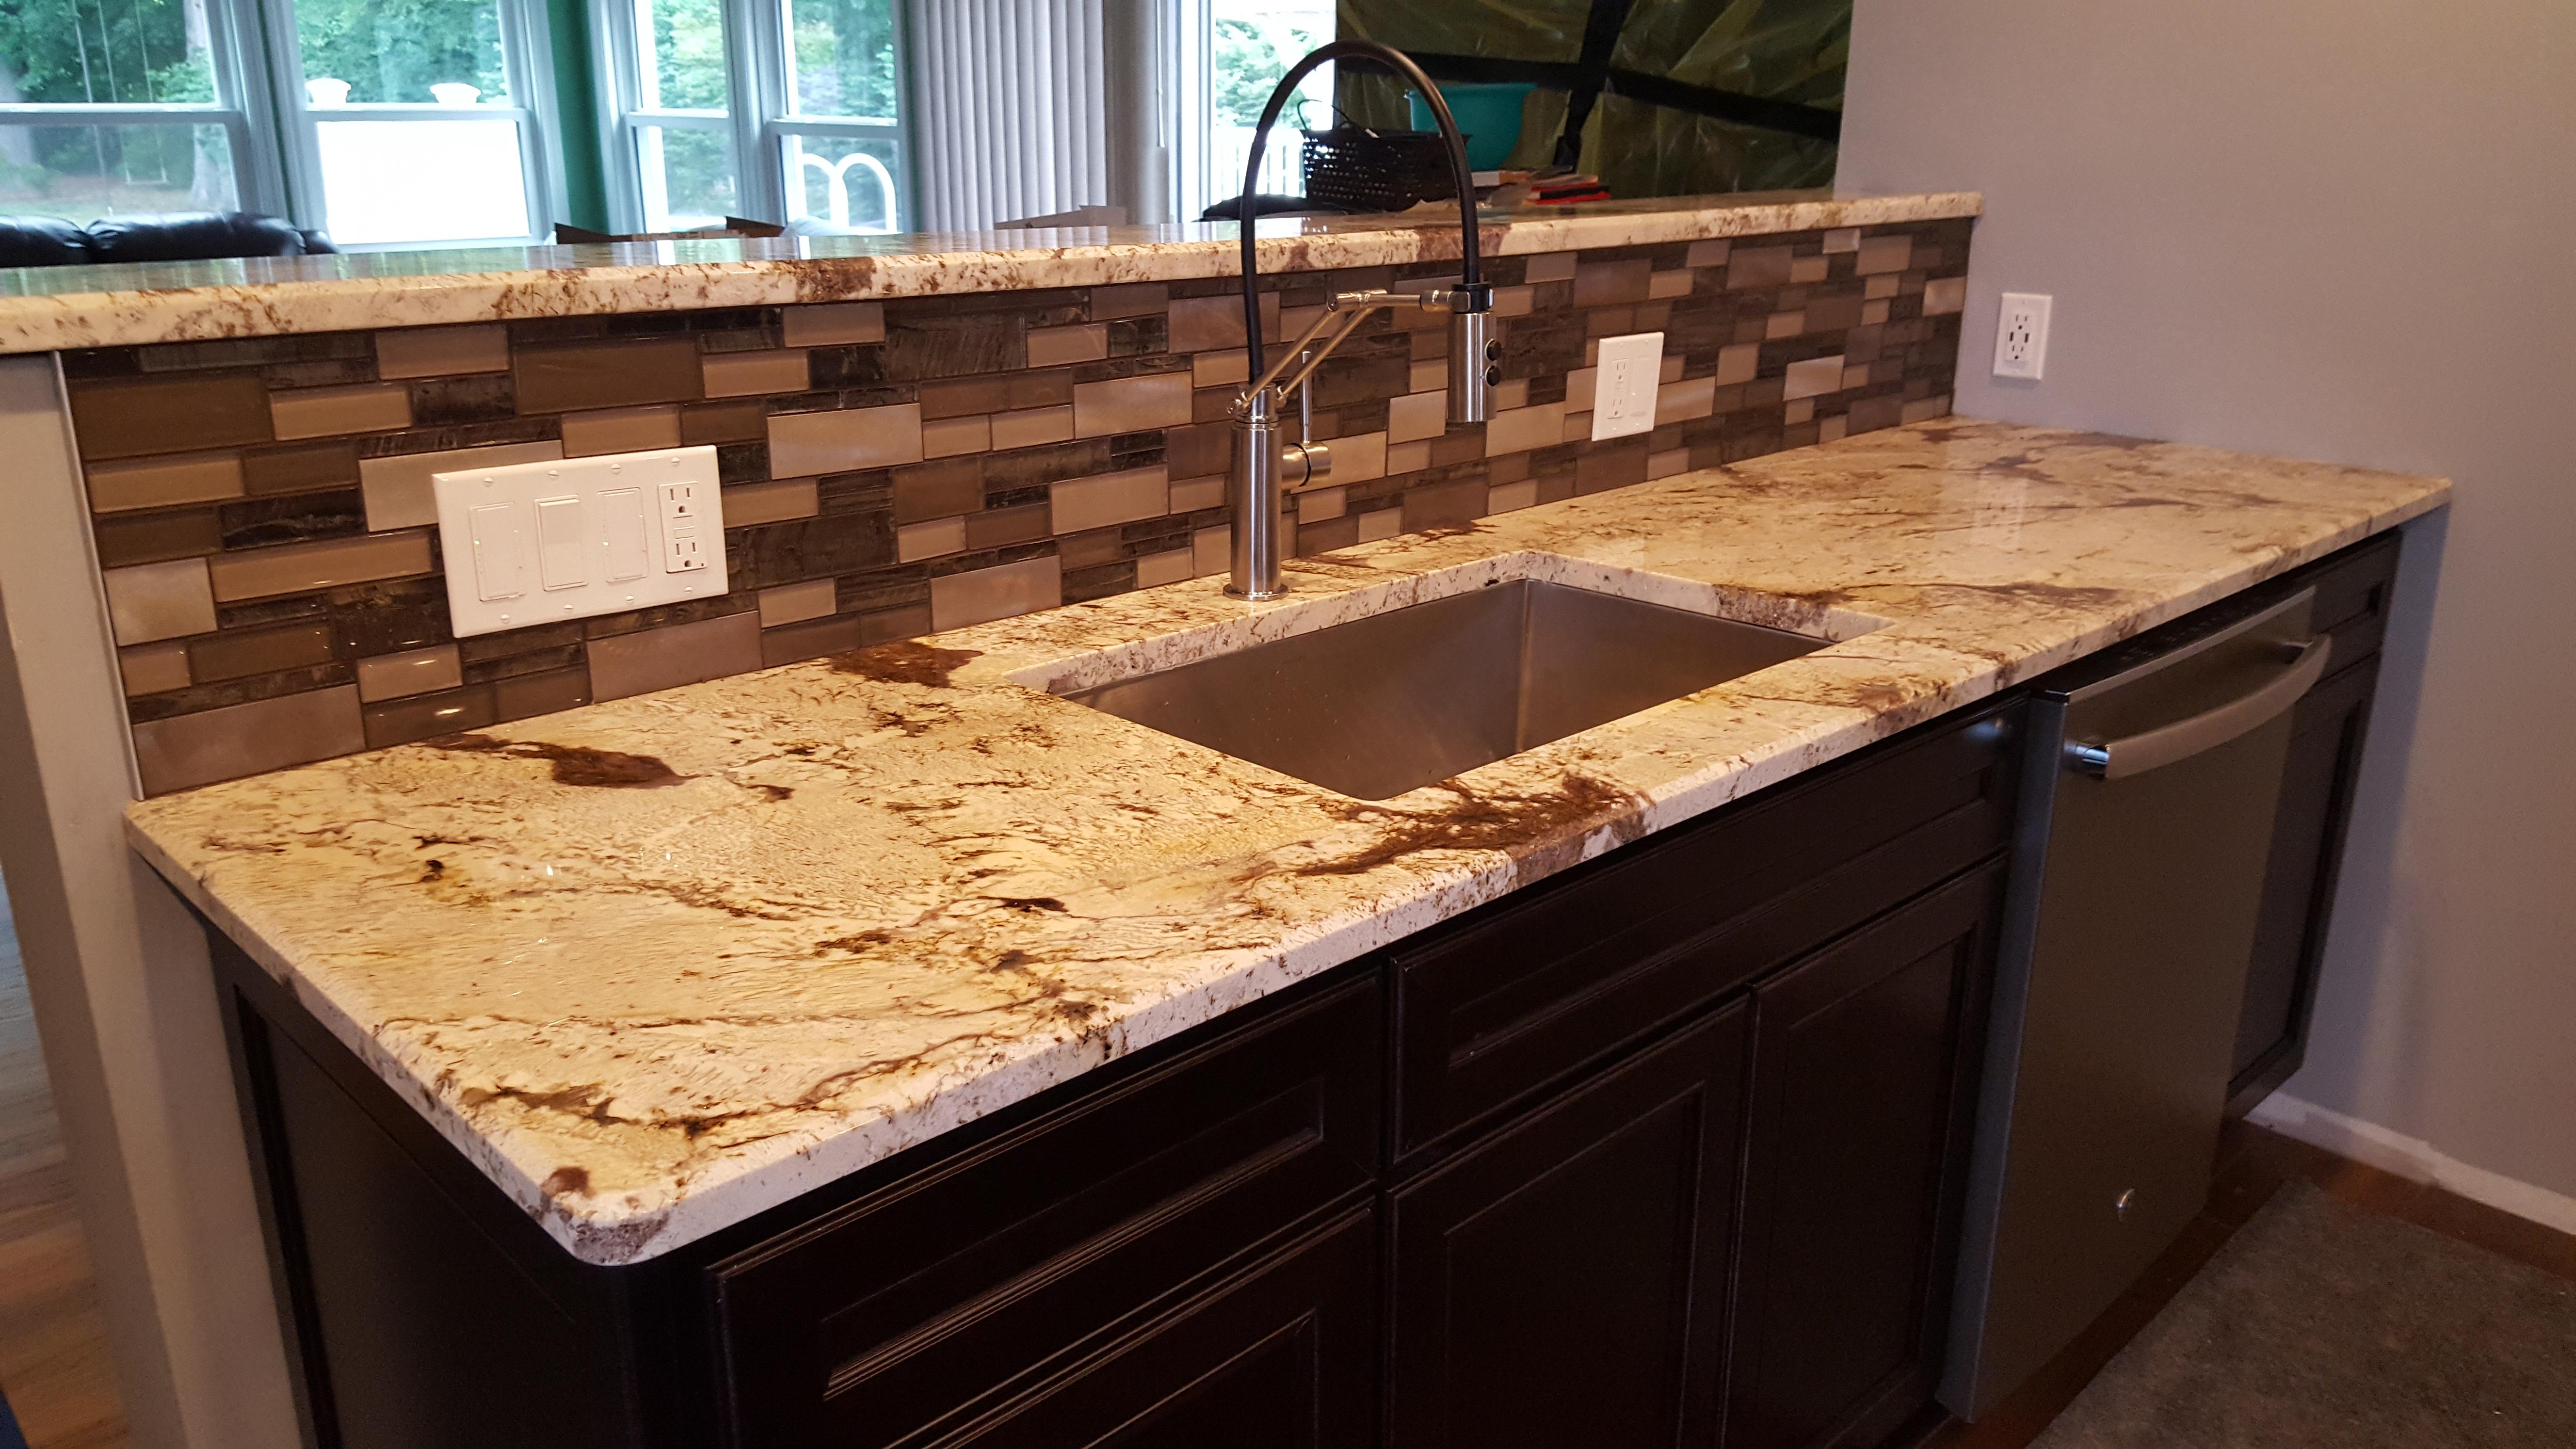 Sink with backsplash